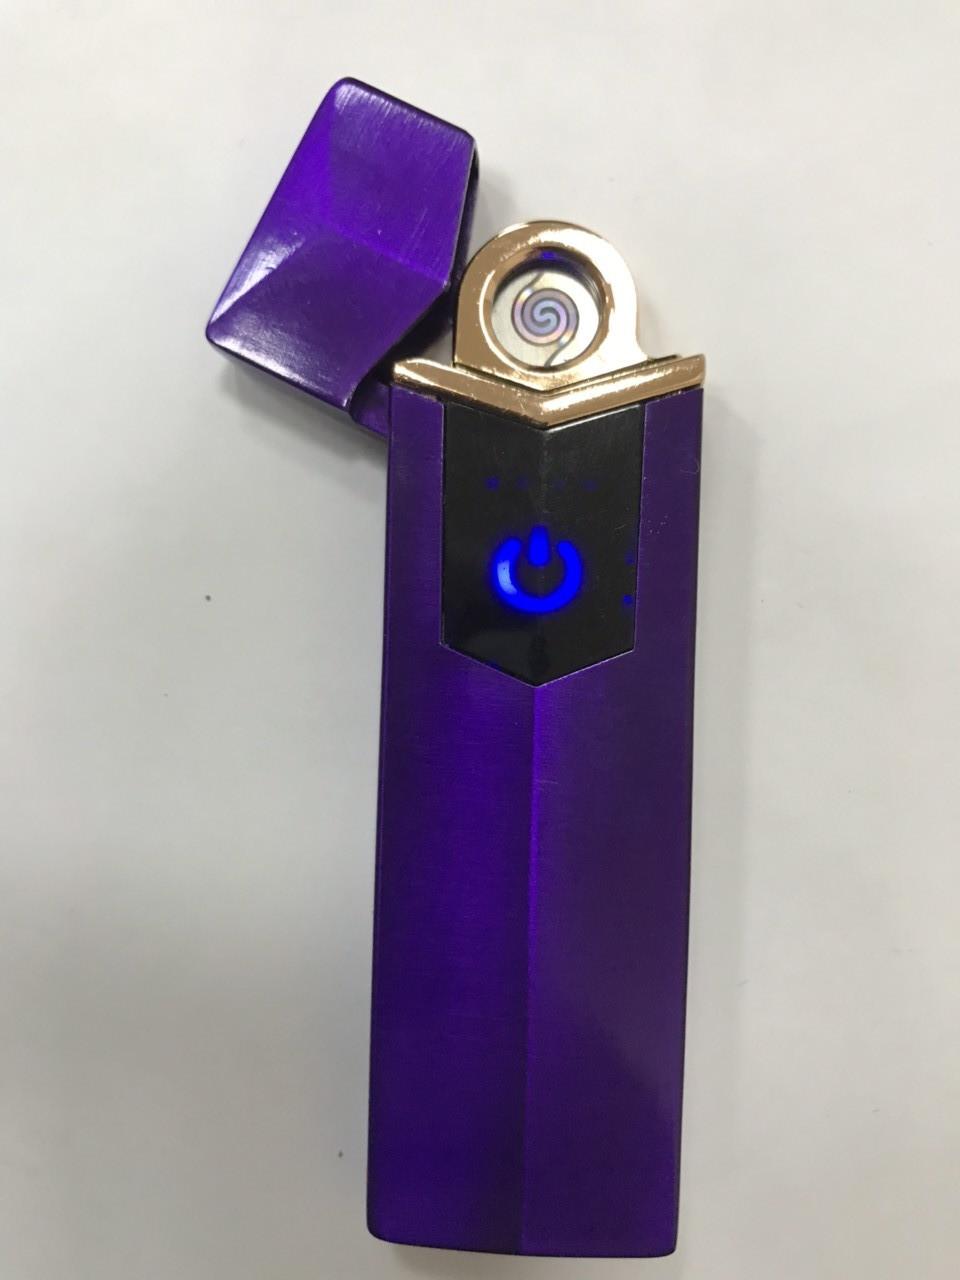 Сенсорная USB зажигалка мощная Lighter H2232 AVE